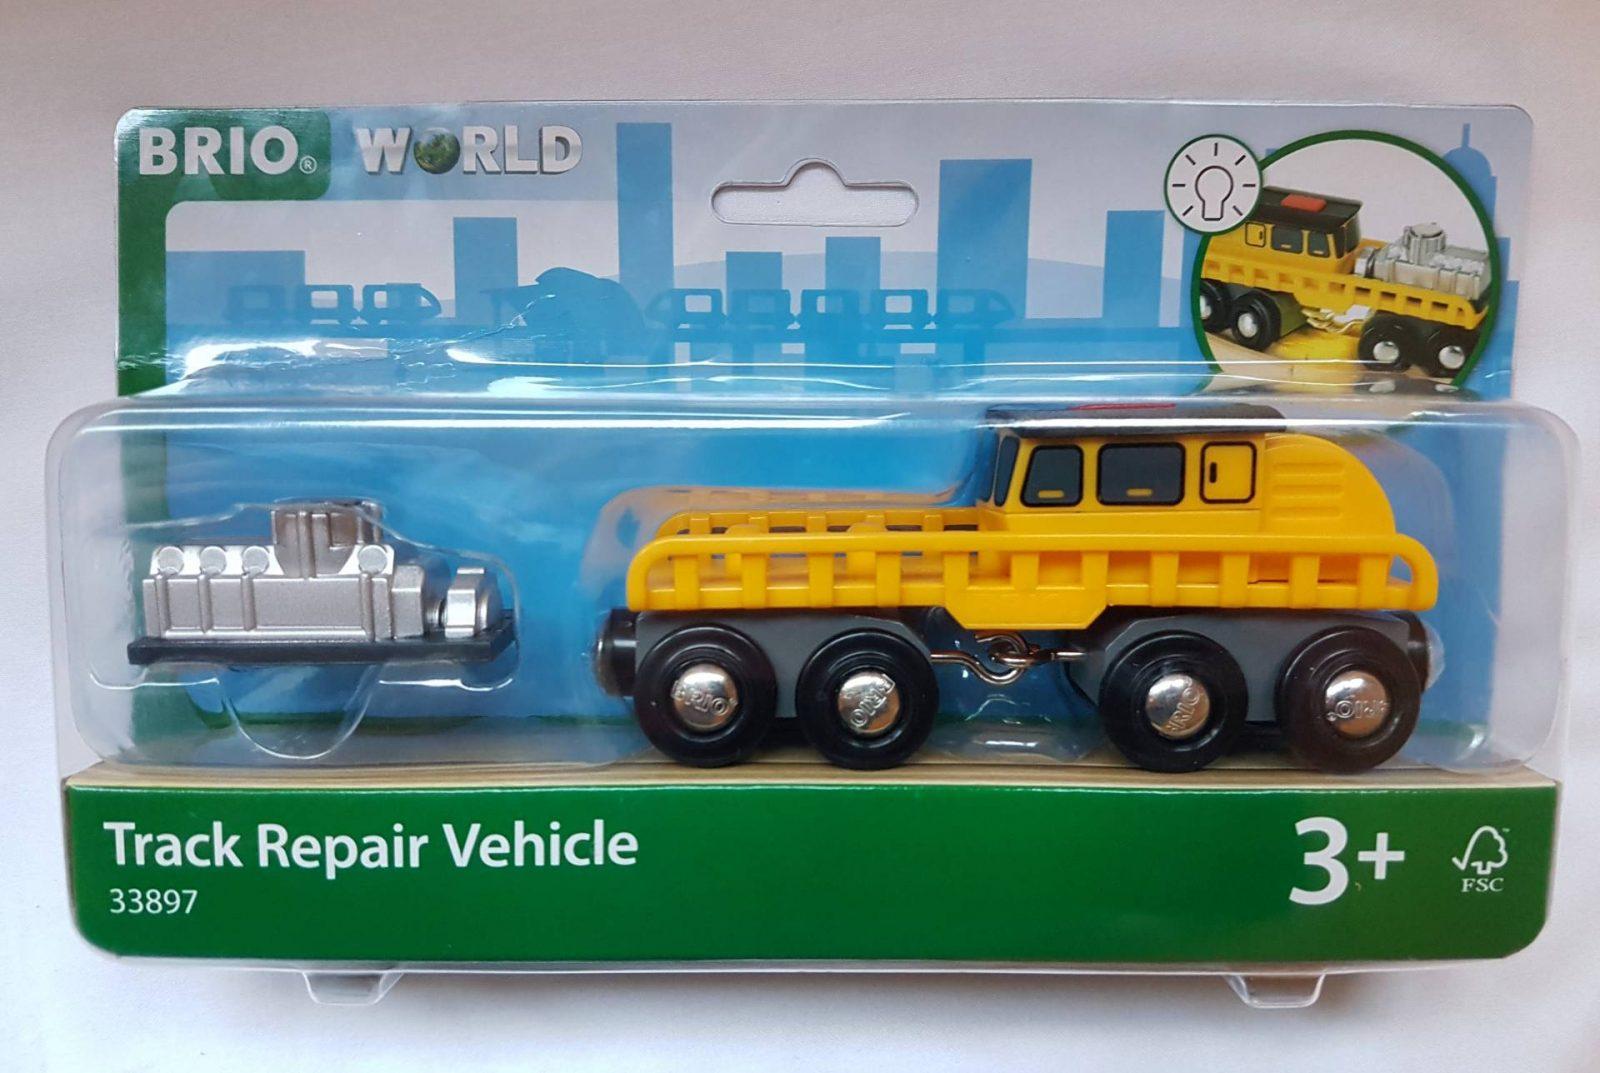 BRIO Track Maintenance Vehicle Review